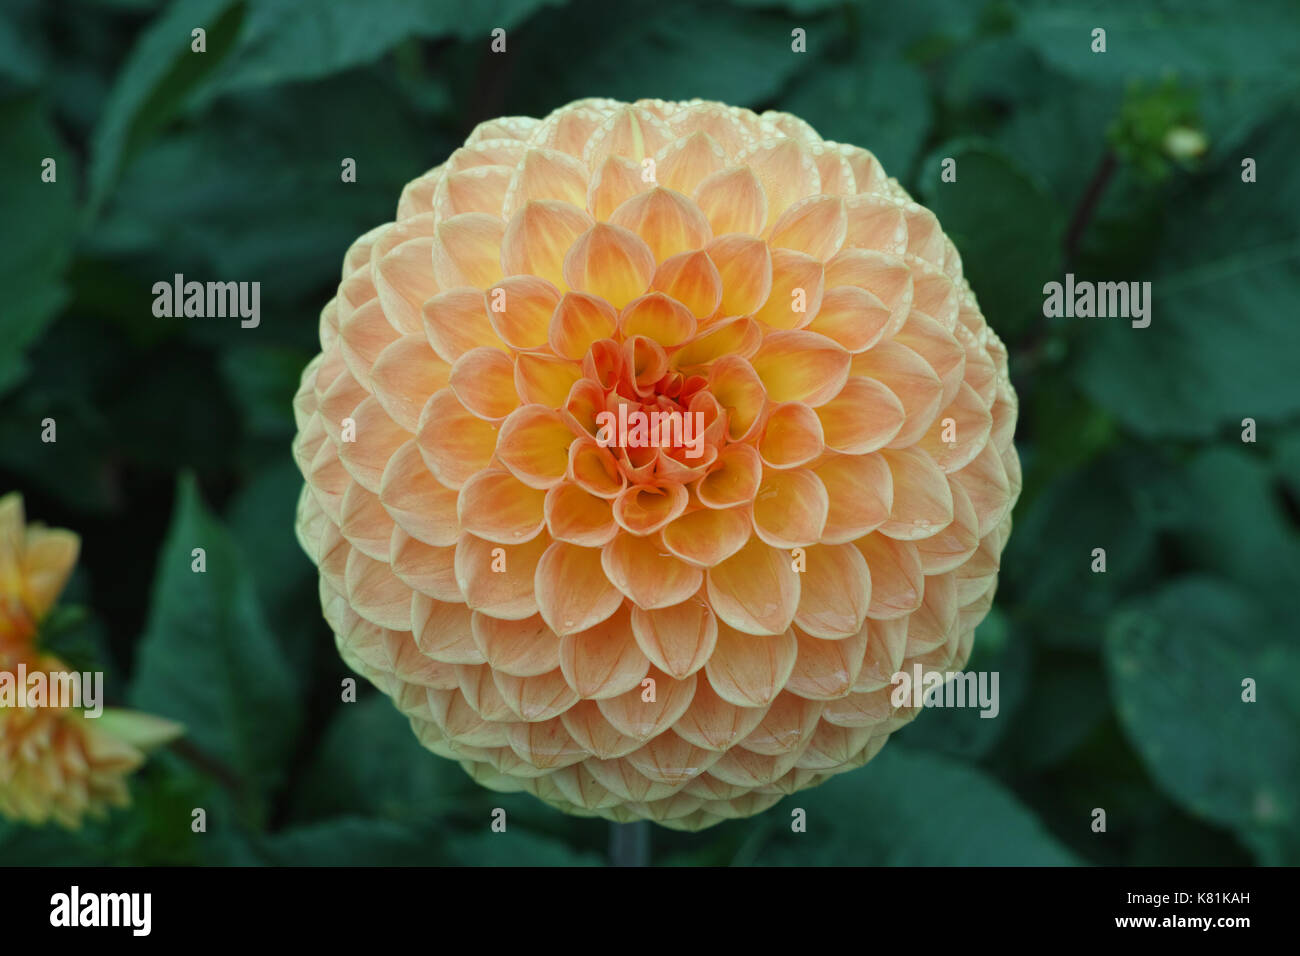 Salmon Orange Dahlia Flower On The Plant Beautiful Bouquet Or Stock